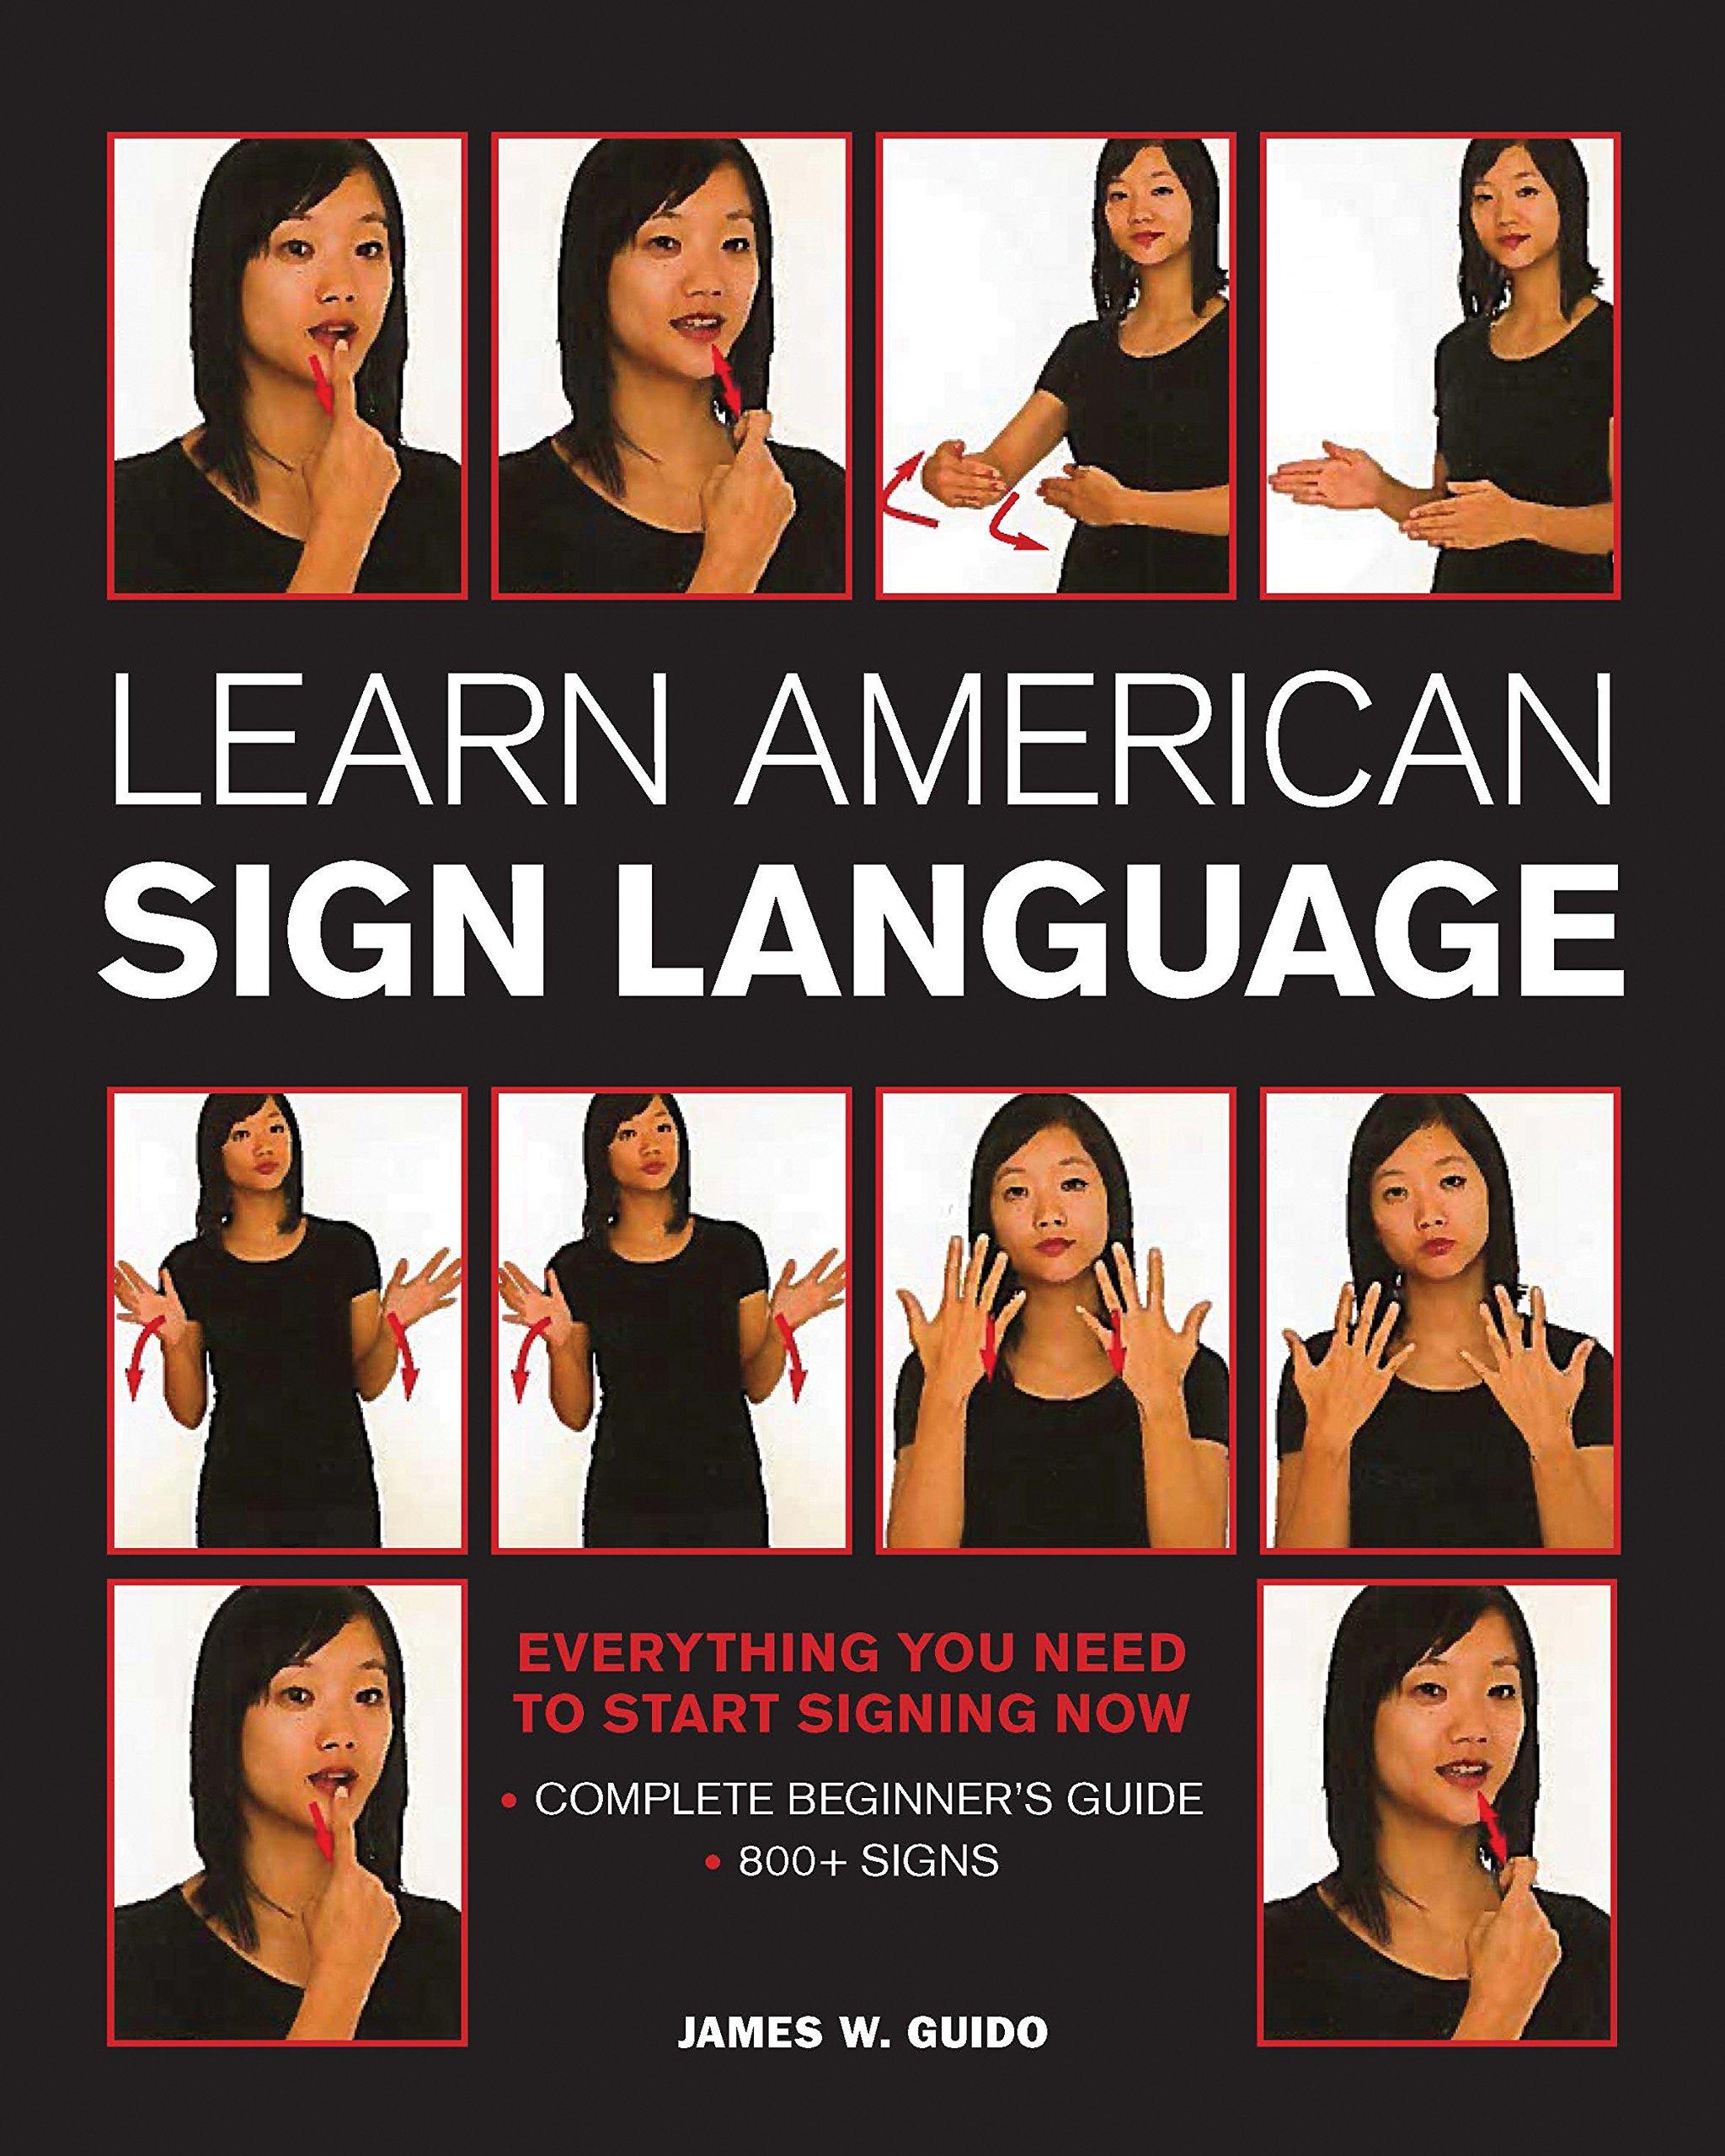 Learn American Sign Language by Wellfleet Press